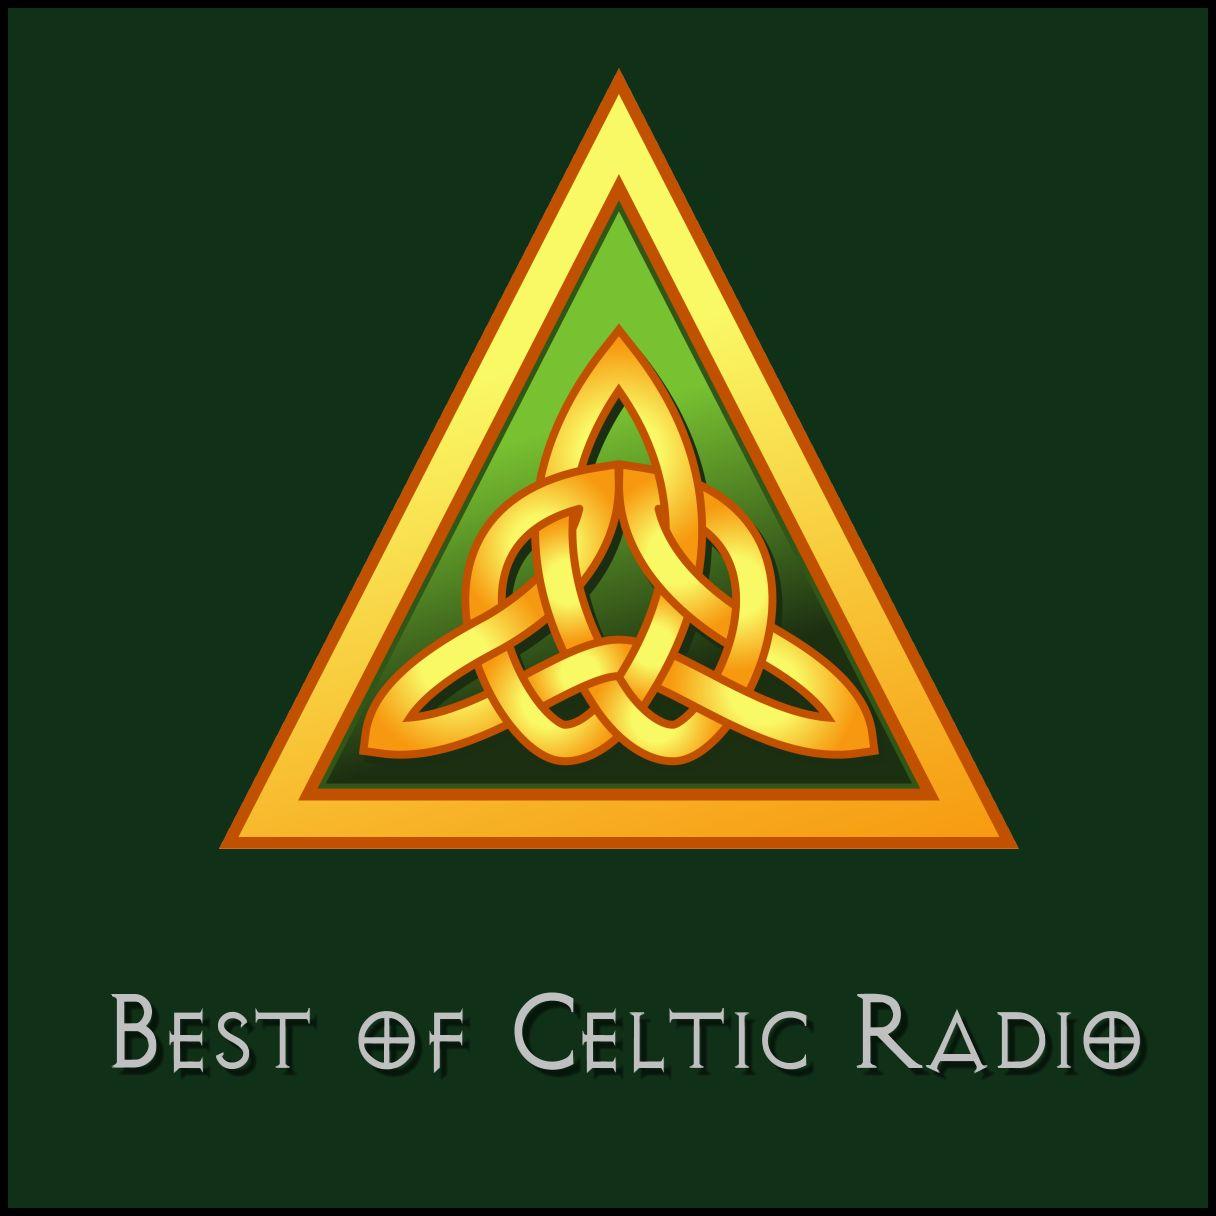 Best of Celtic Radio